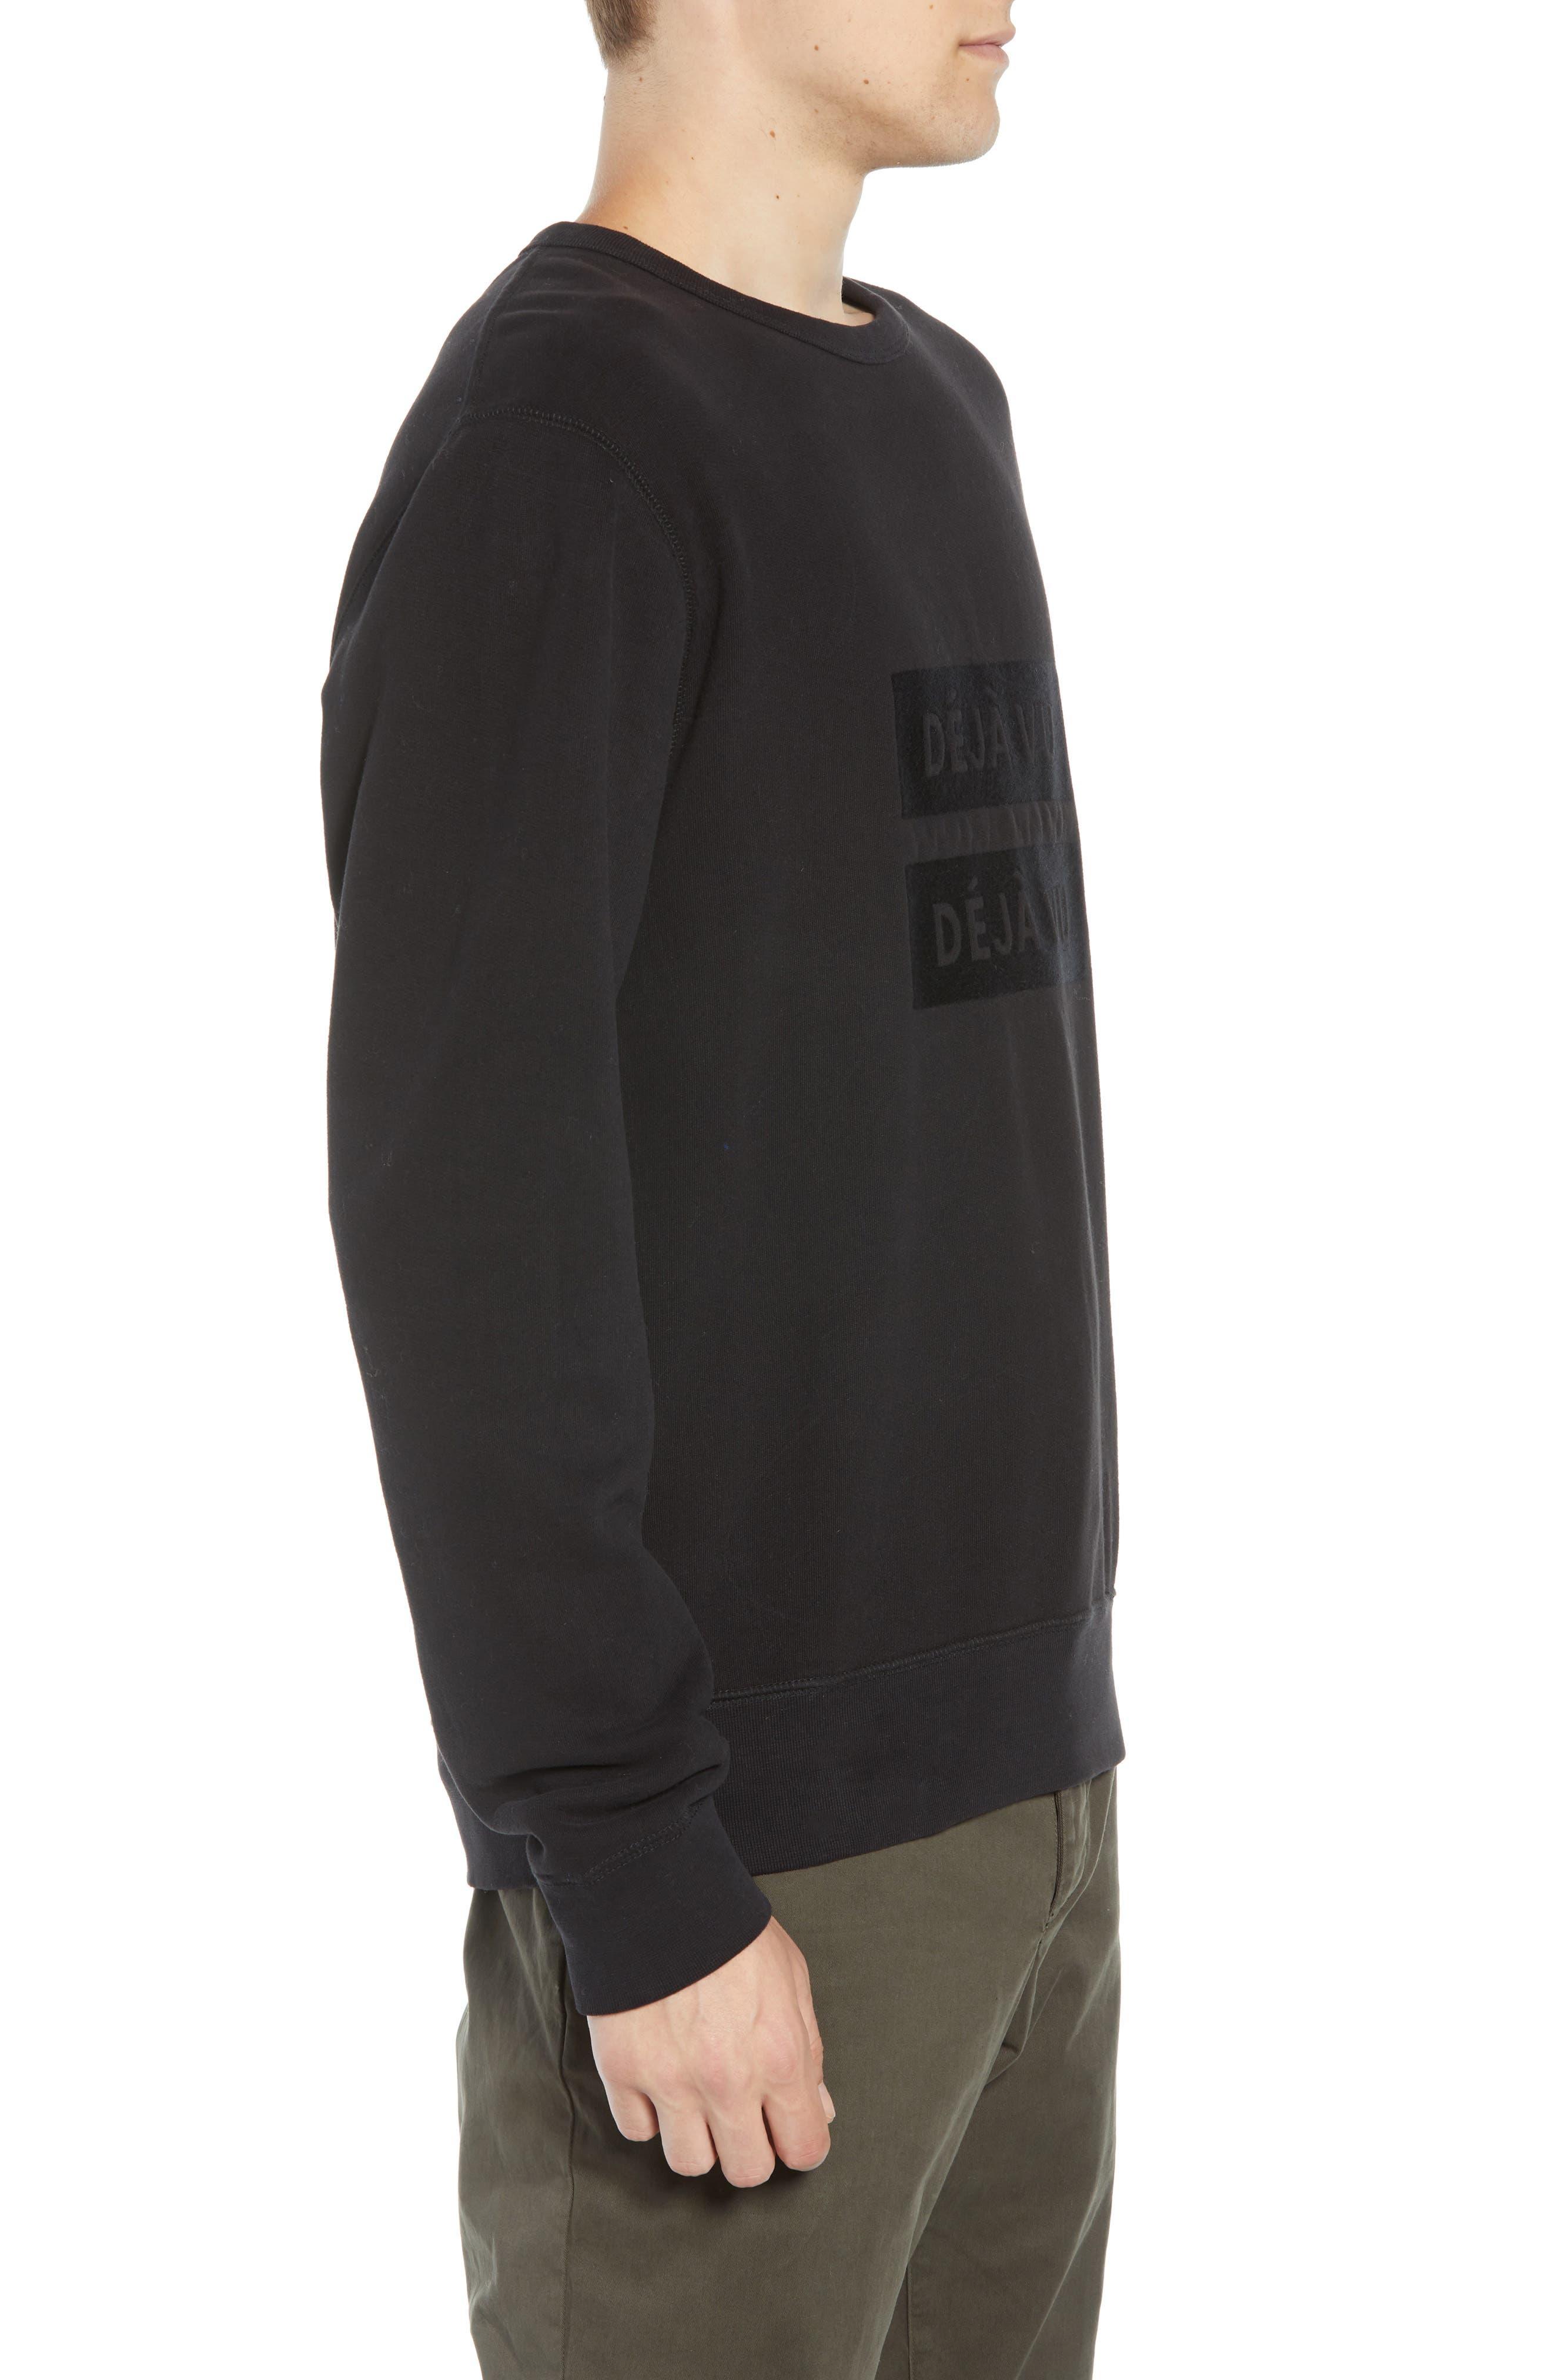 Déjà Vu Sweatshirt,                             Alternate thumbnail 3, color,                             BLACK BLACK